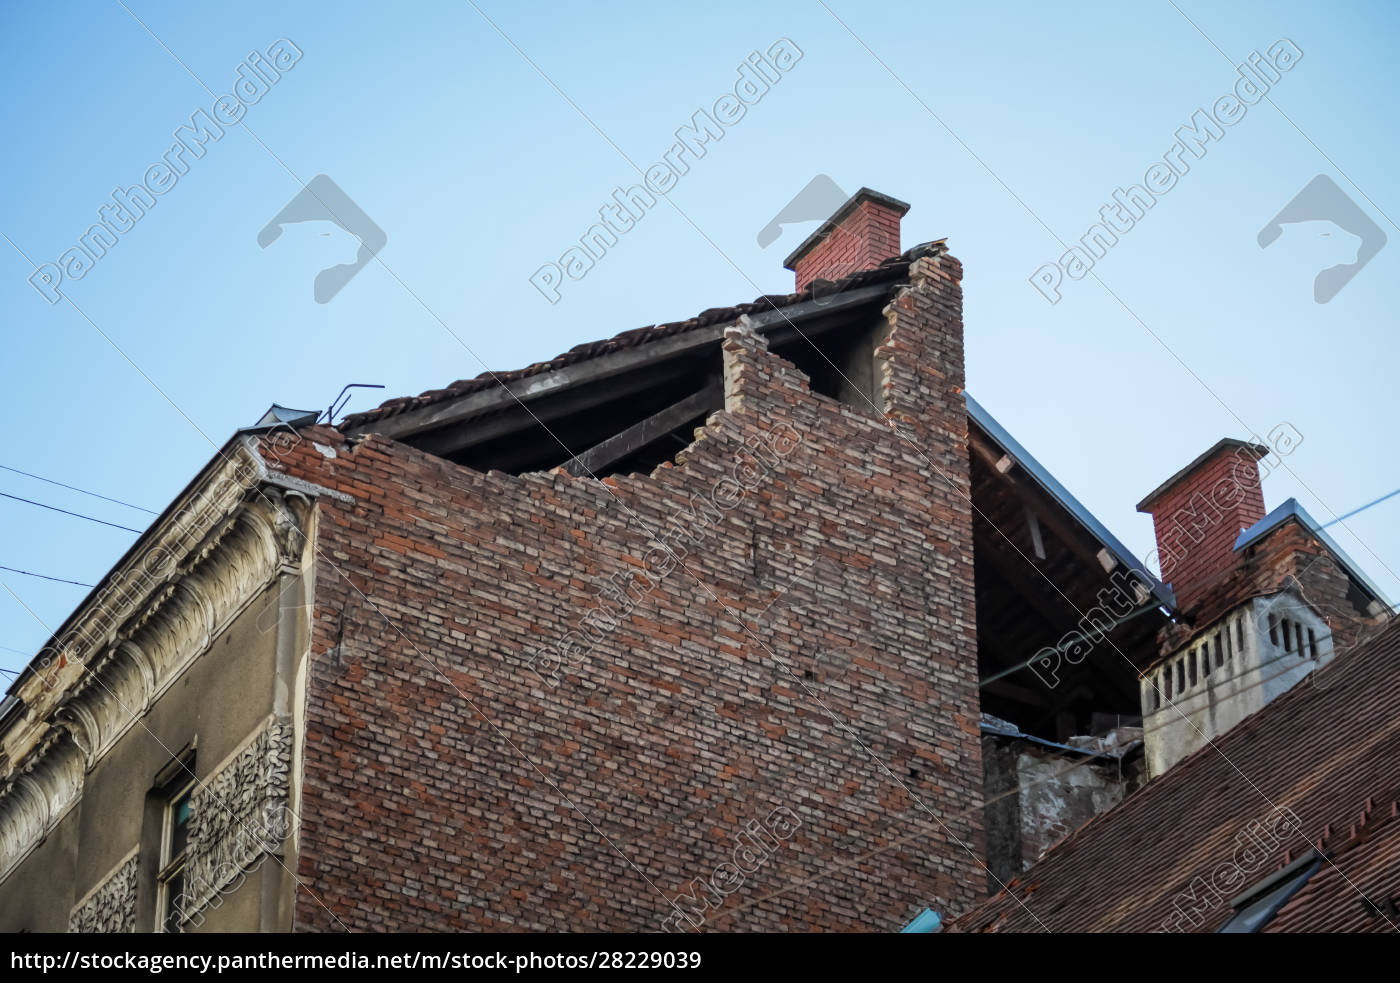 zagreb, atingido, pelo, terremoto - 28229039